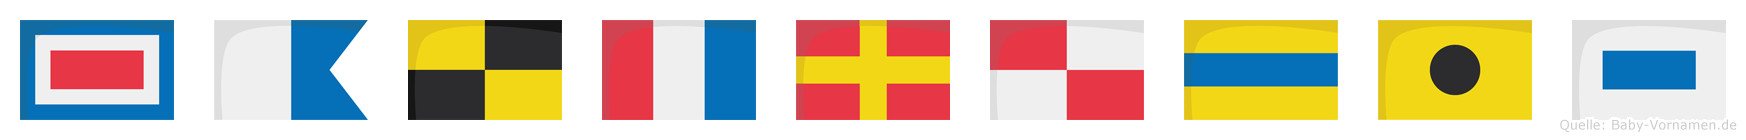 Waltrudis im Flaggenalphabet